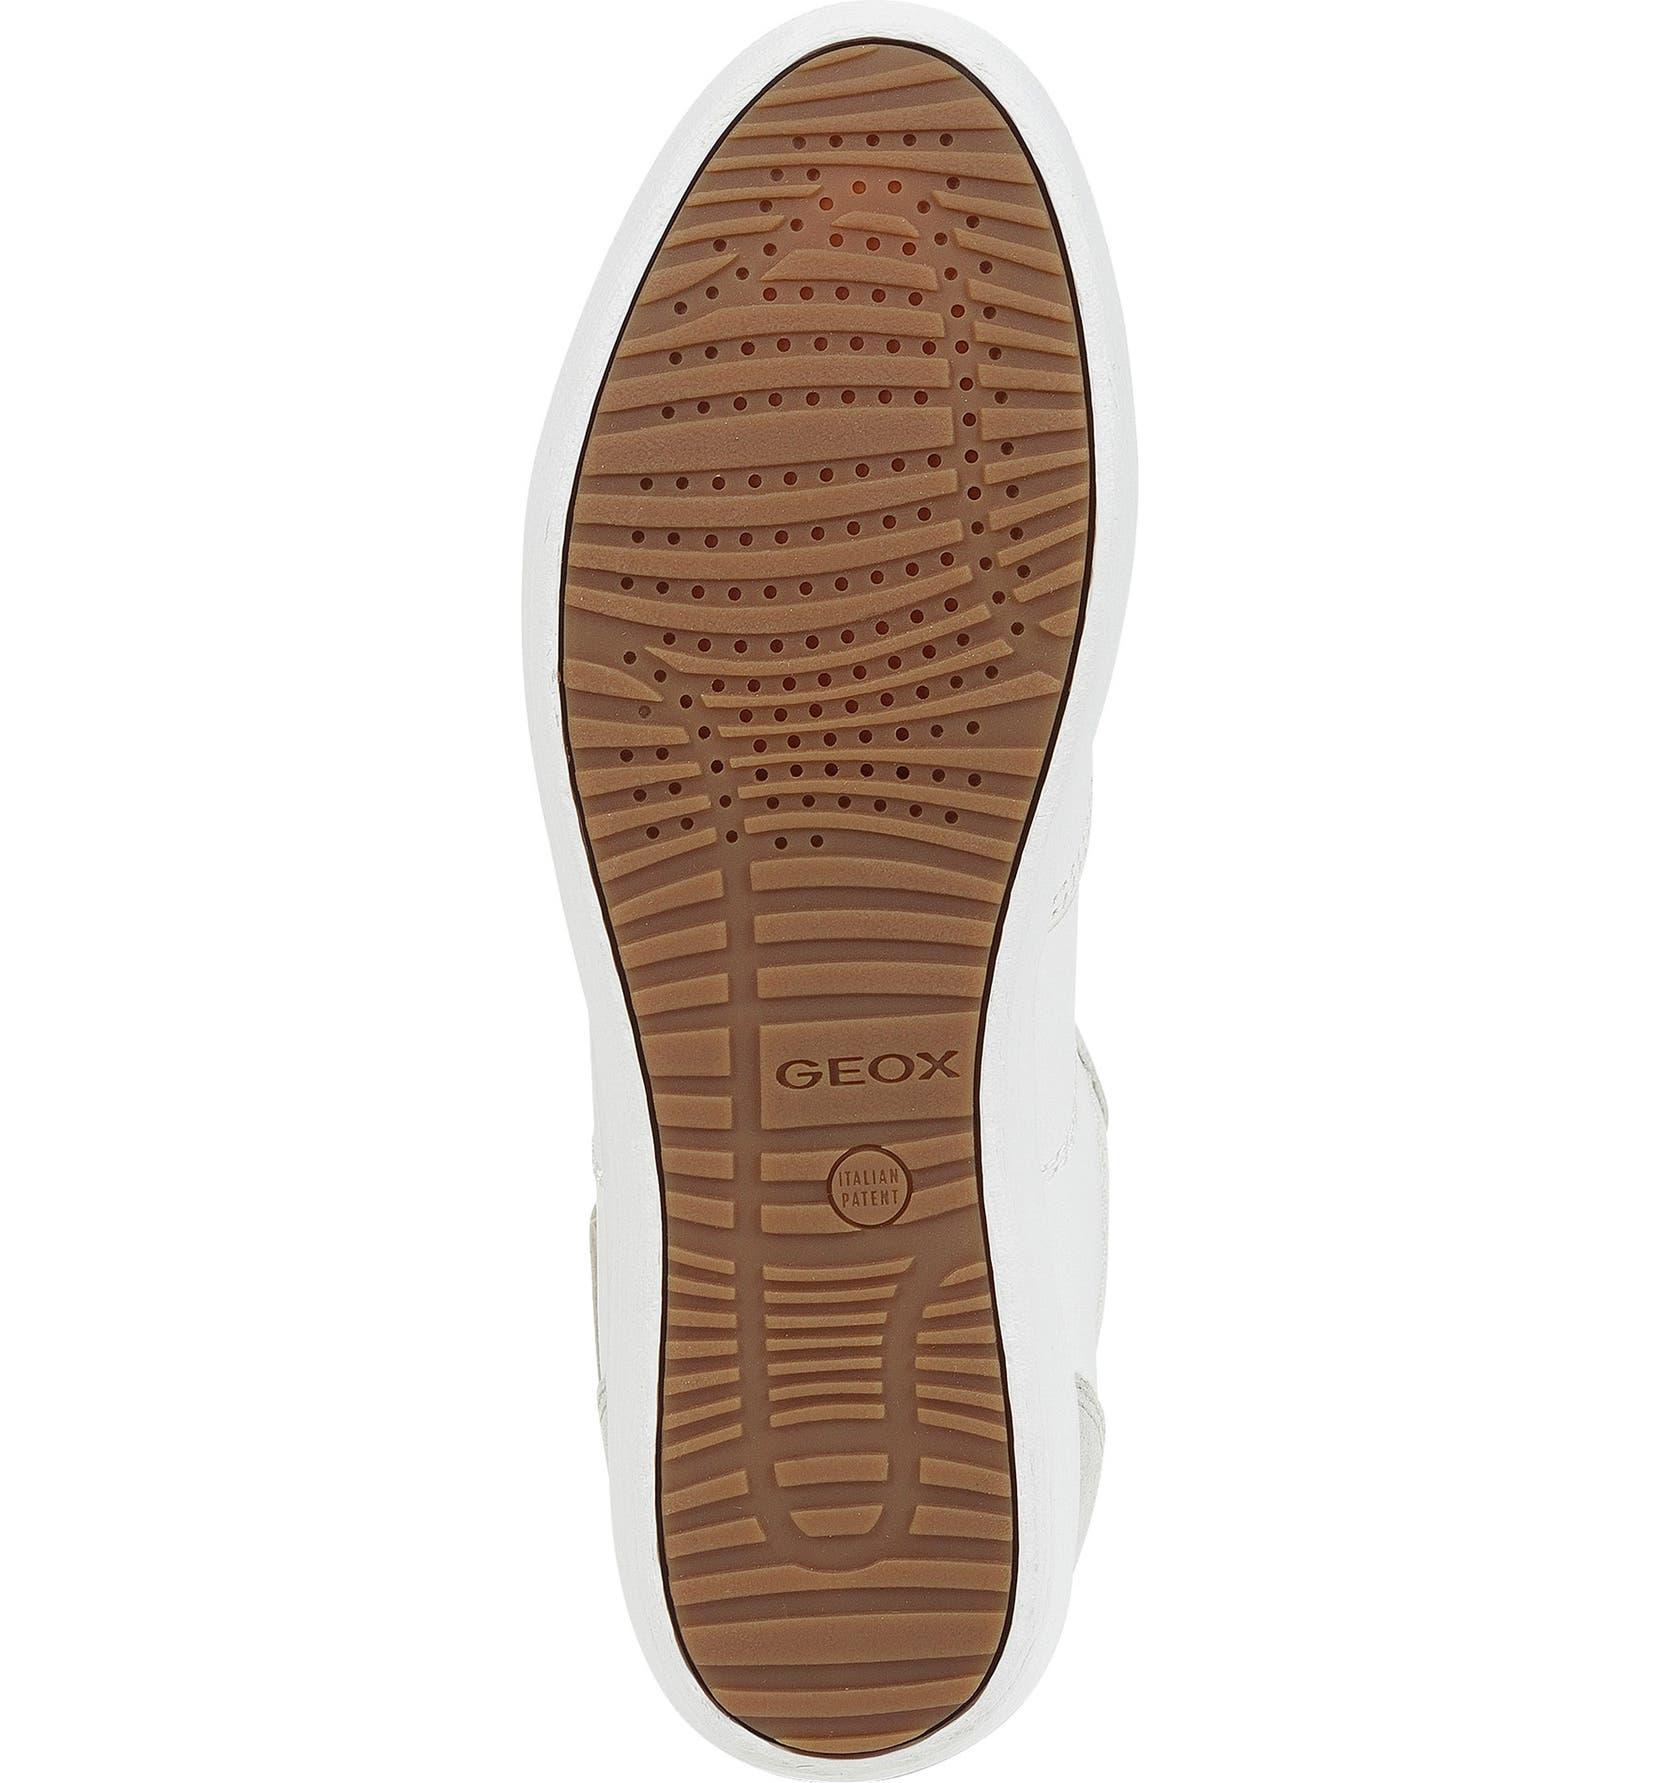 Geox Myria High Top Sneaker (Women) | Nordstrom